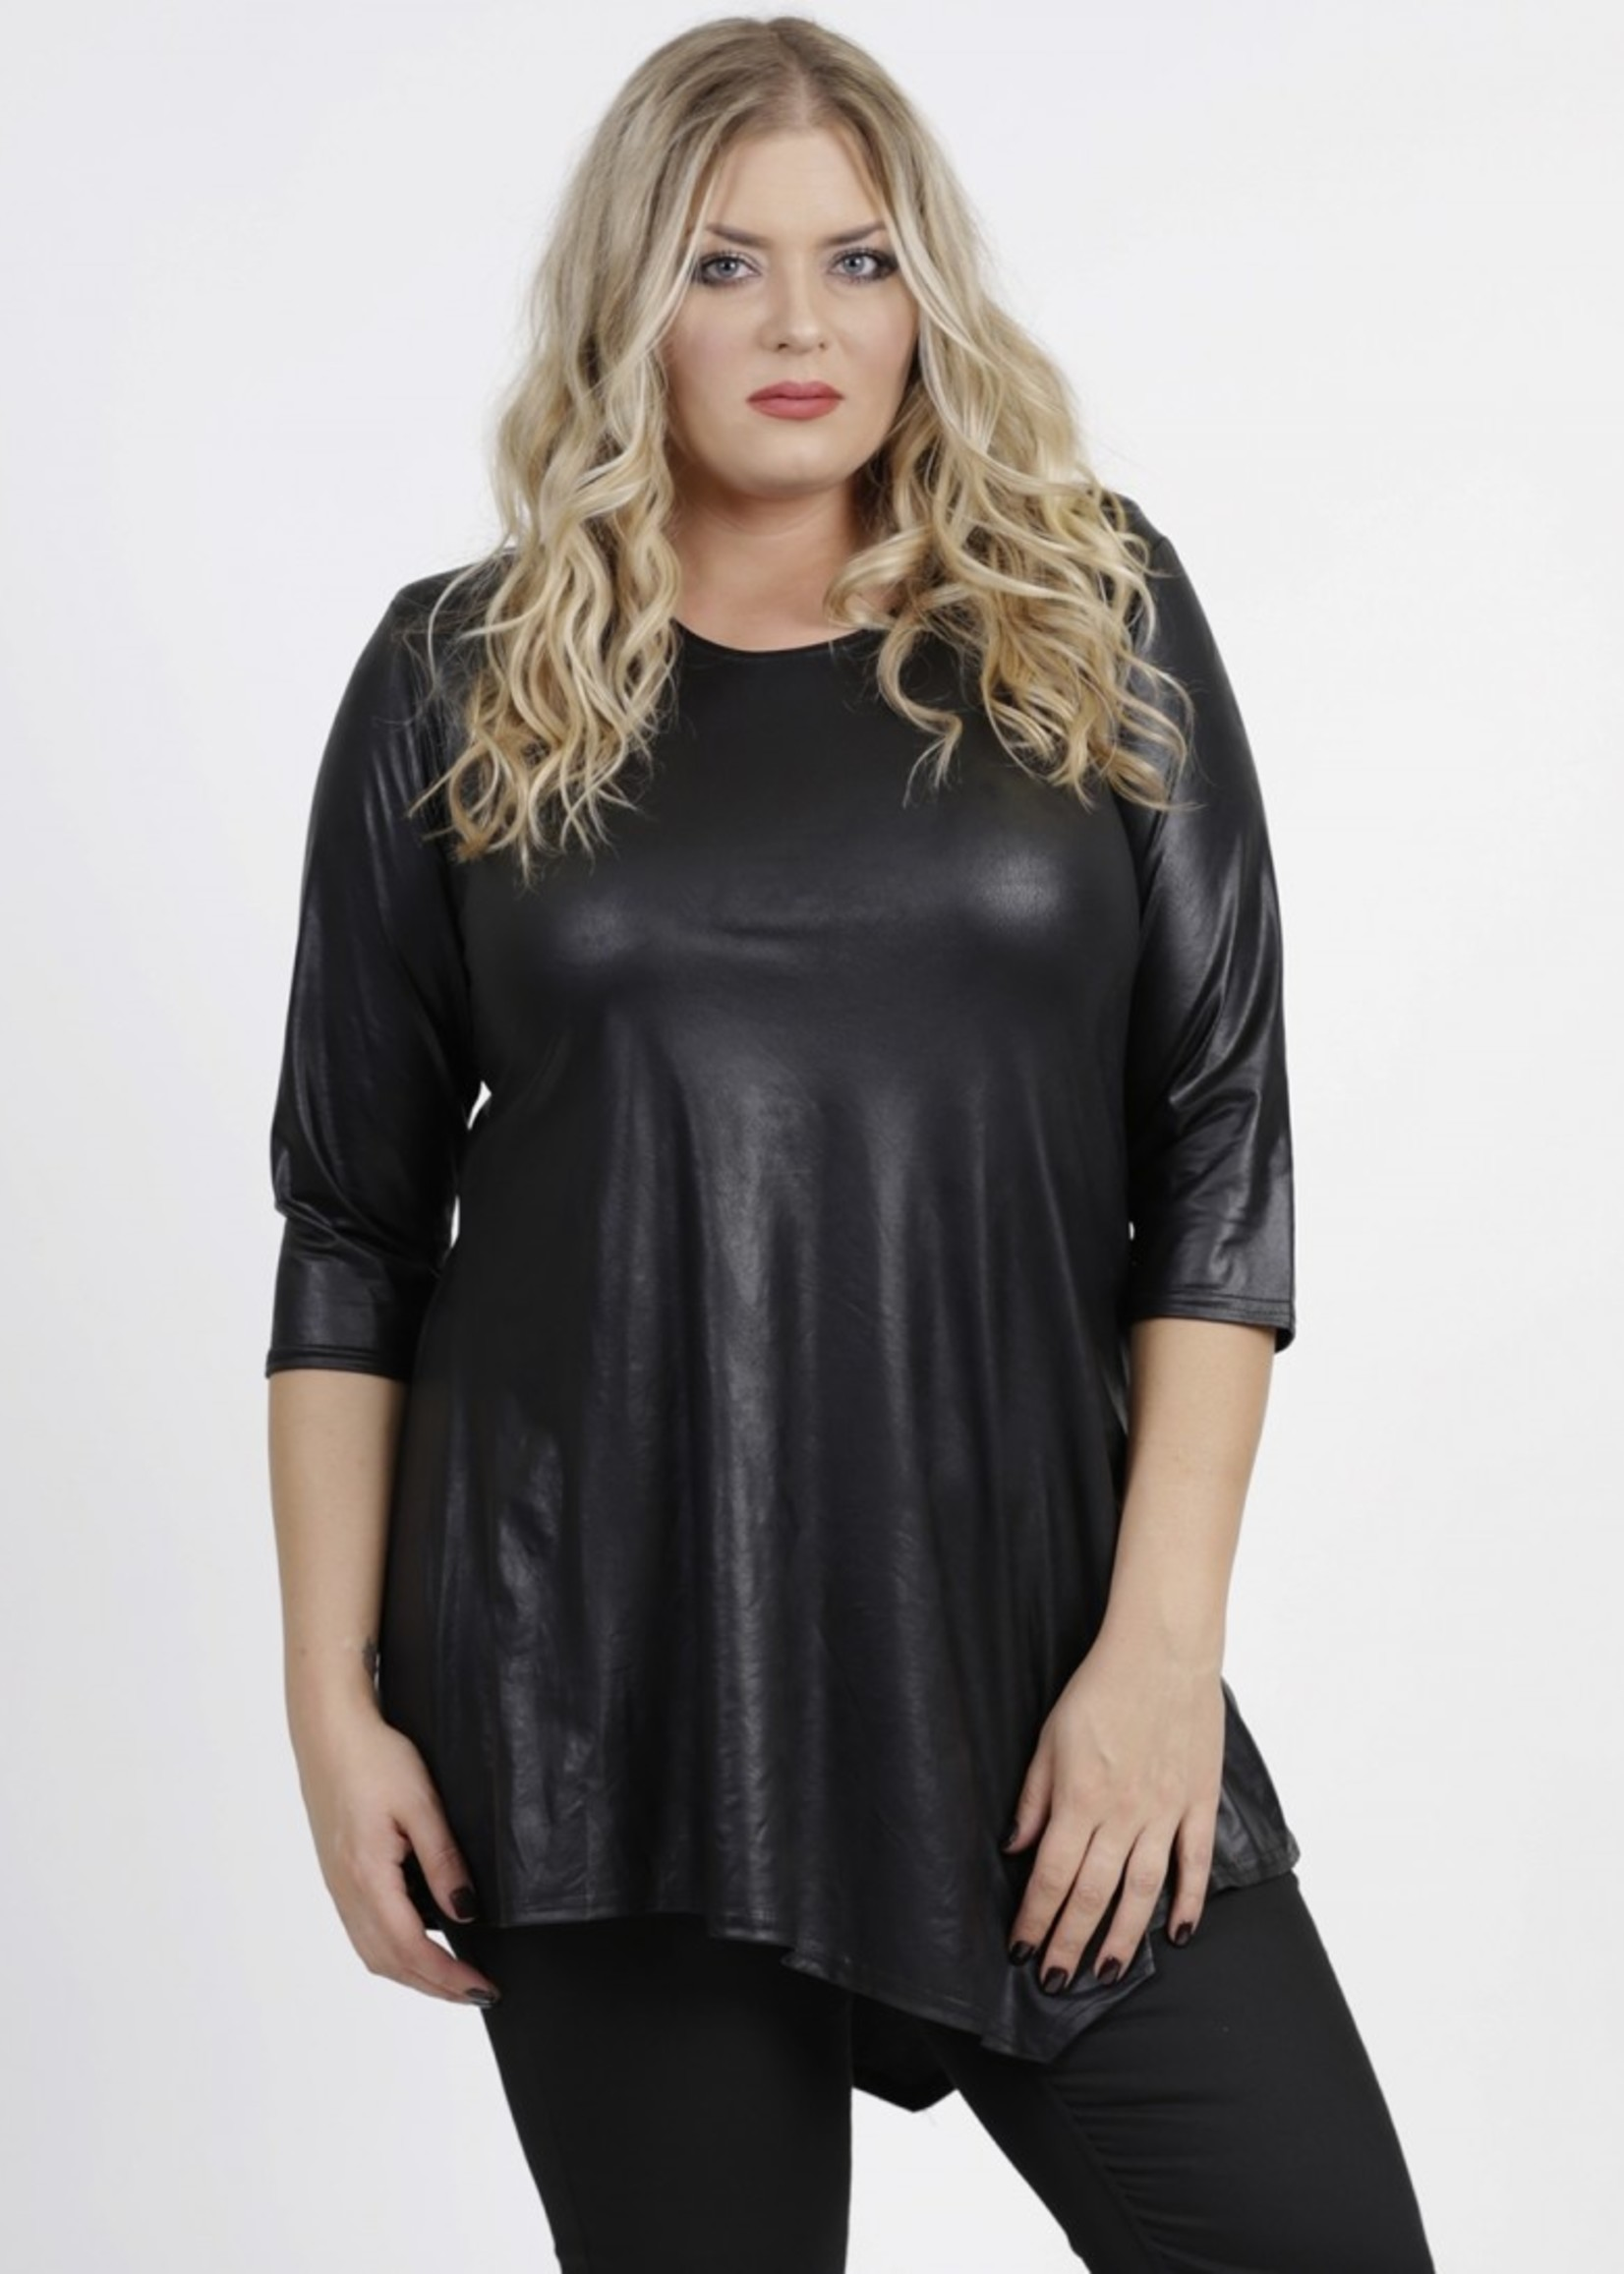 Magna Fashion T-Shirt B93 LEATHERLOOK